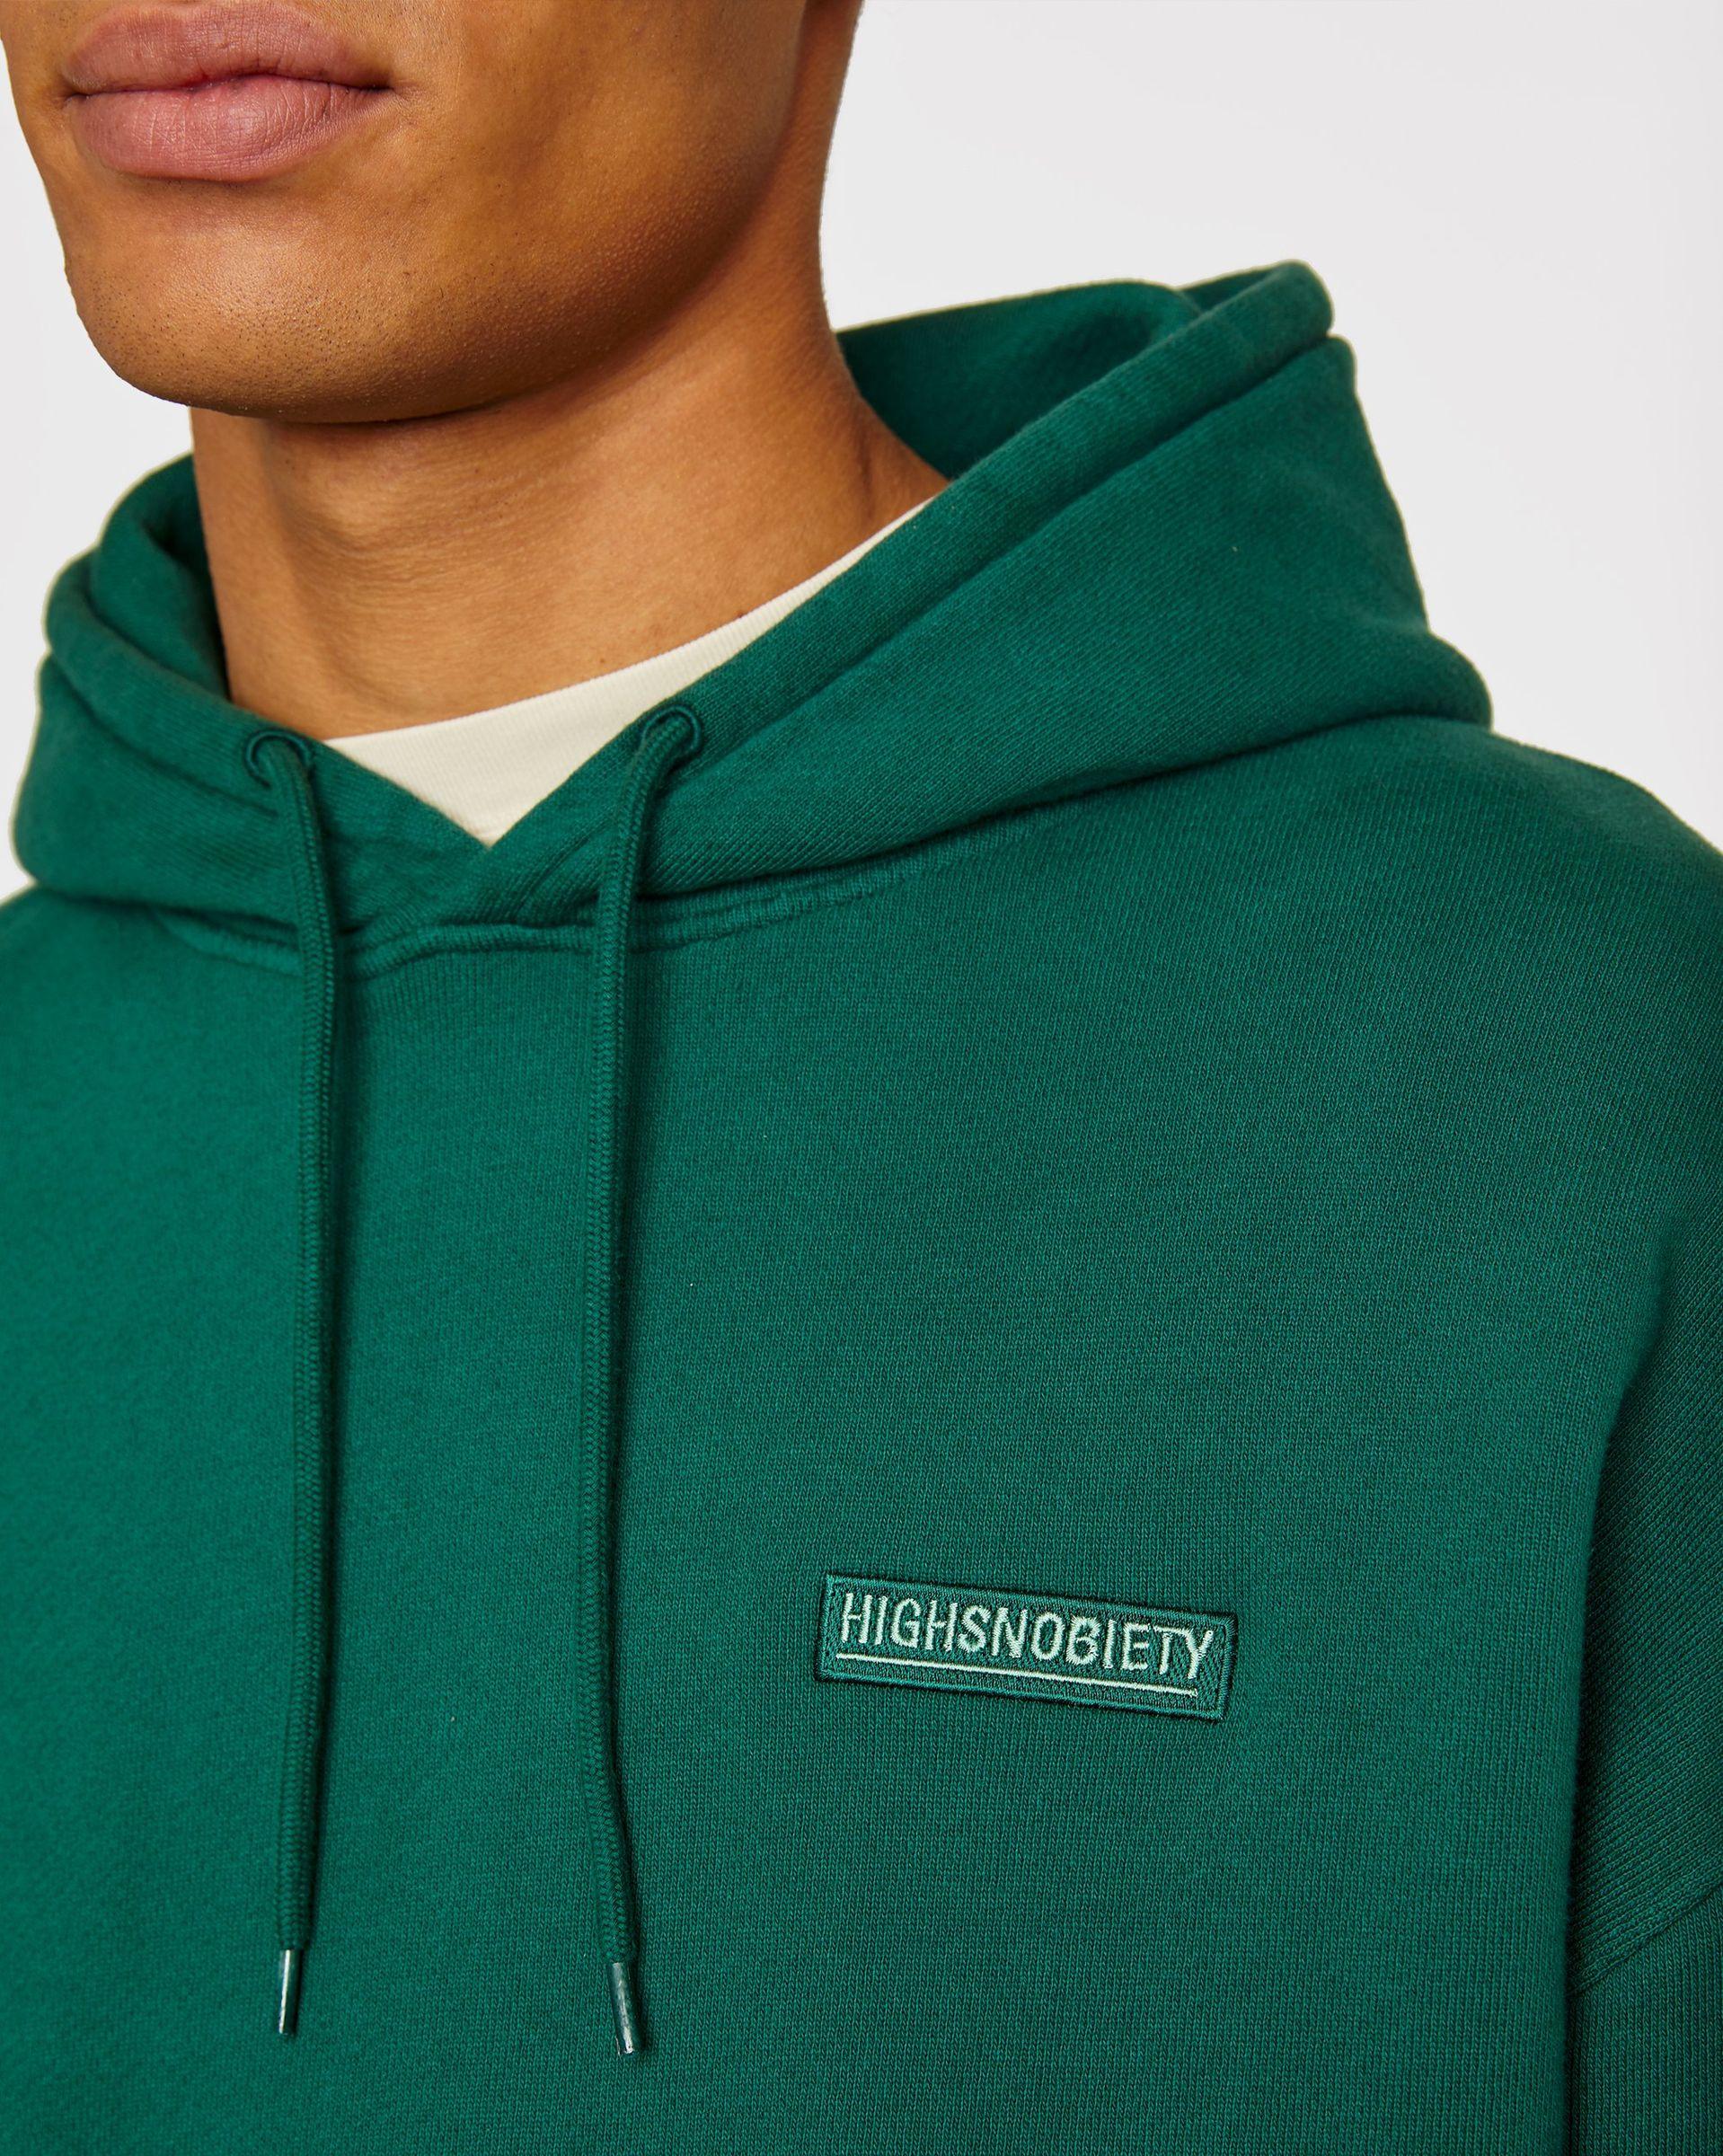 Highsnobiety Staples - Hoodie Green - Image 5